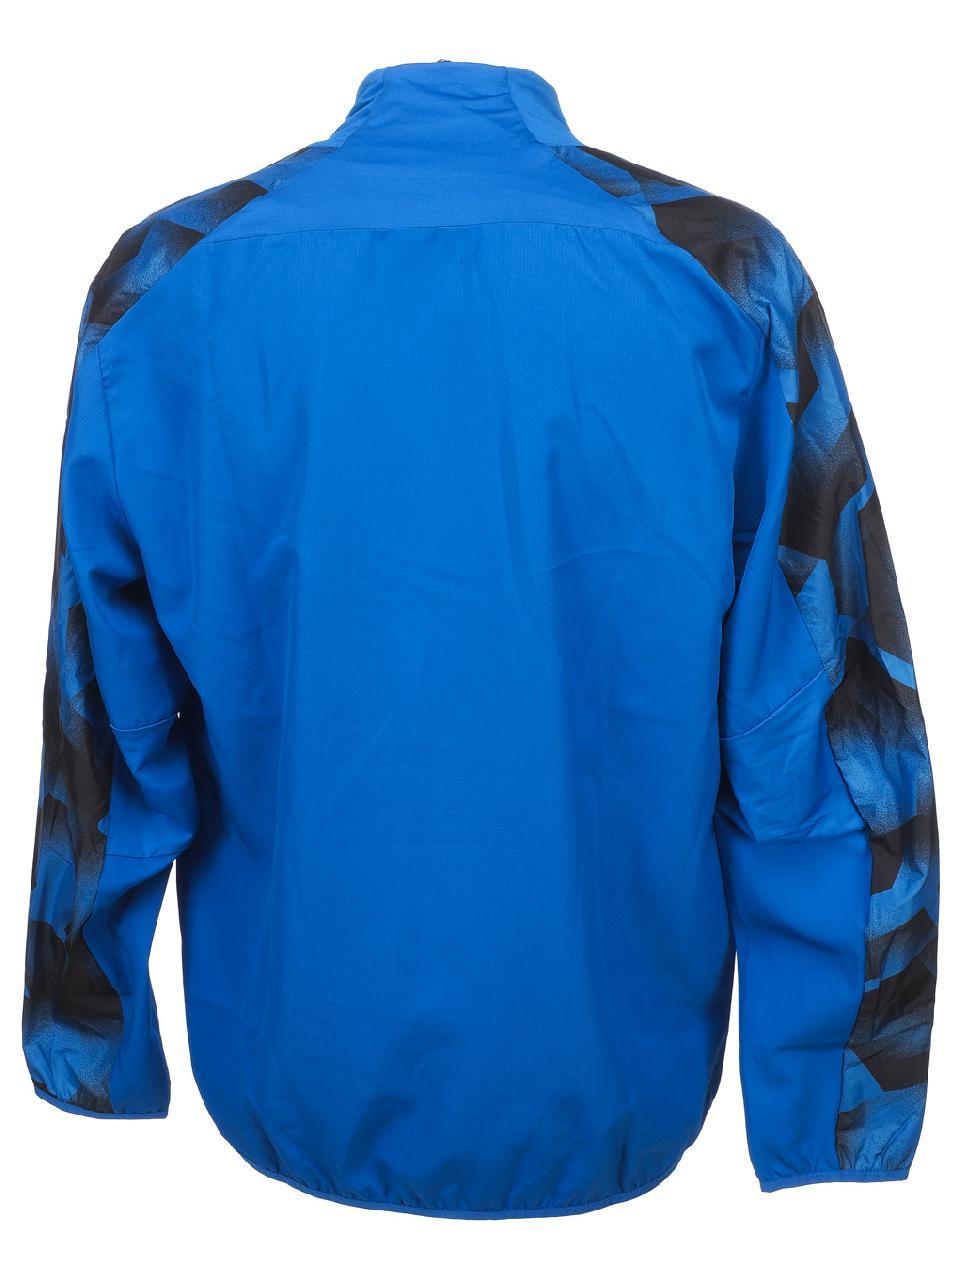 Jacken-Von-Jogginganzug-Tracktops-Adidas-Tanc-Wov-Spur-Blau-Blau-75956-Neu Indexbild 5